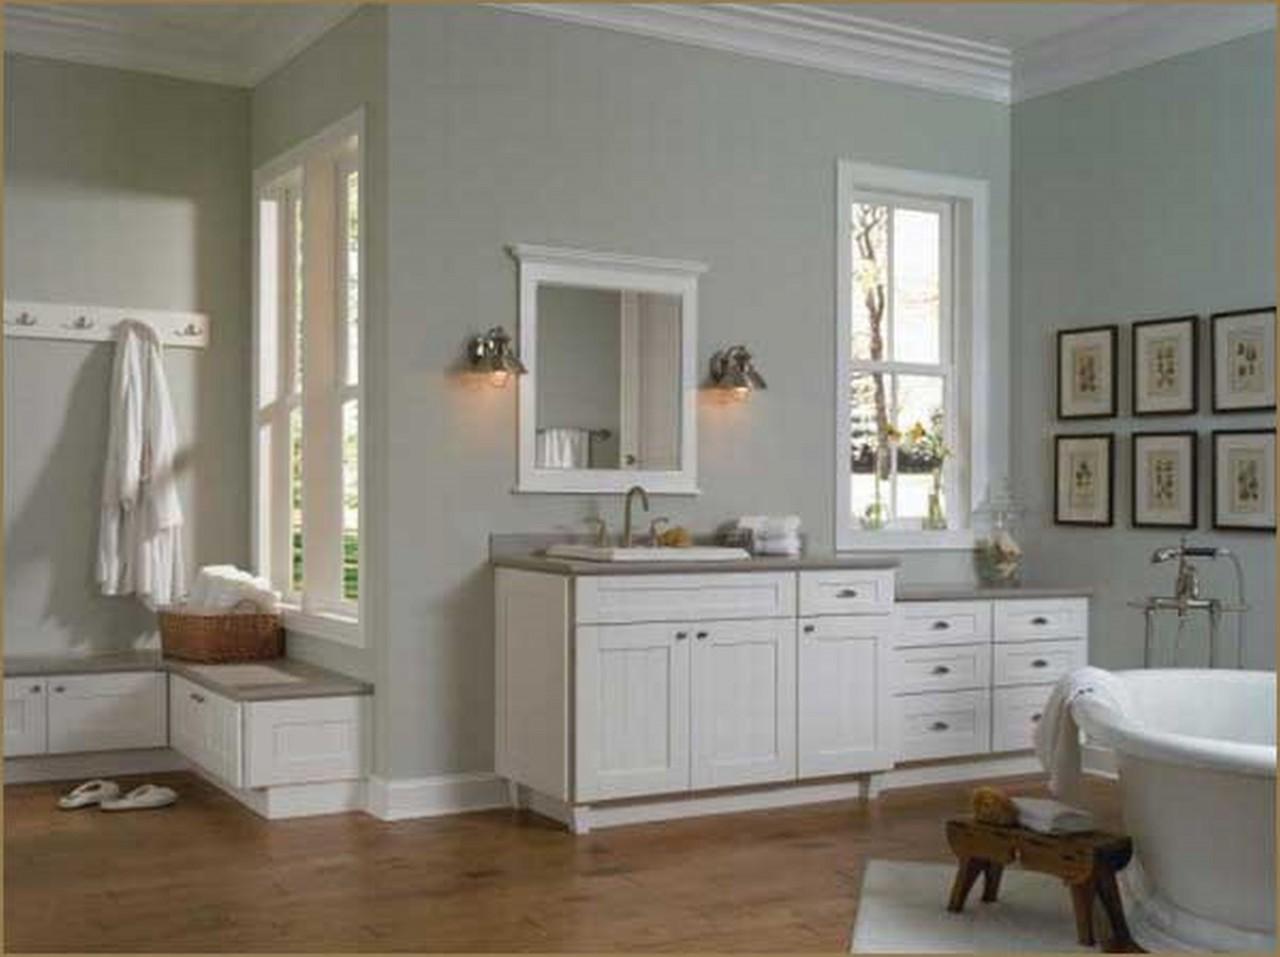 inspiring-master-bath-designs-fantastic-design-11-home-decor